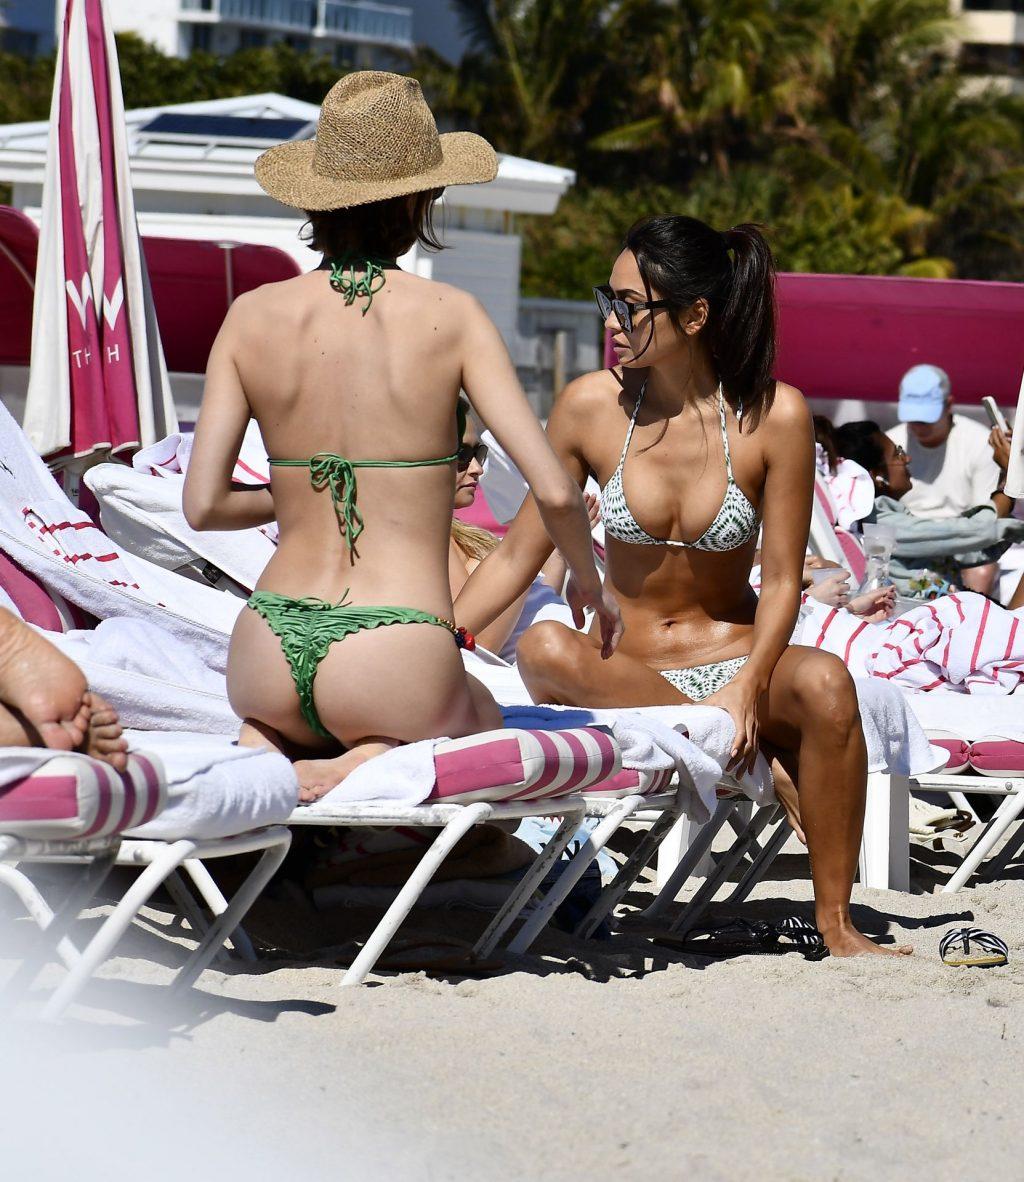 Ambra Gutierrez Hits The Beach in Miami Wearing a Tiny Bikini (62 Photos + Video)